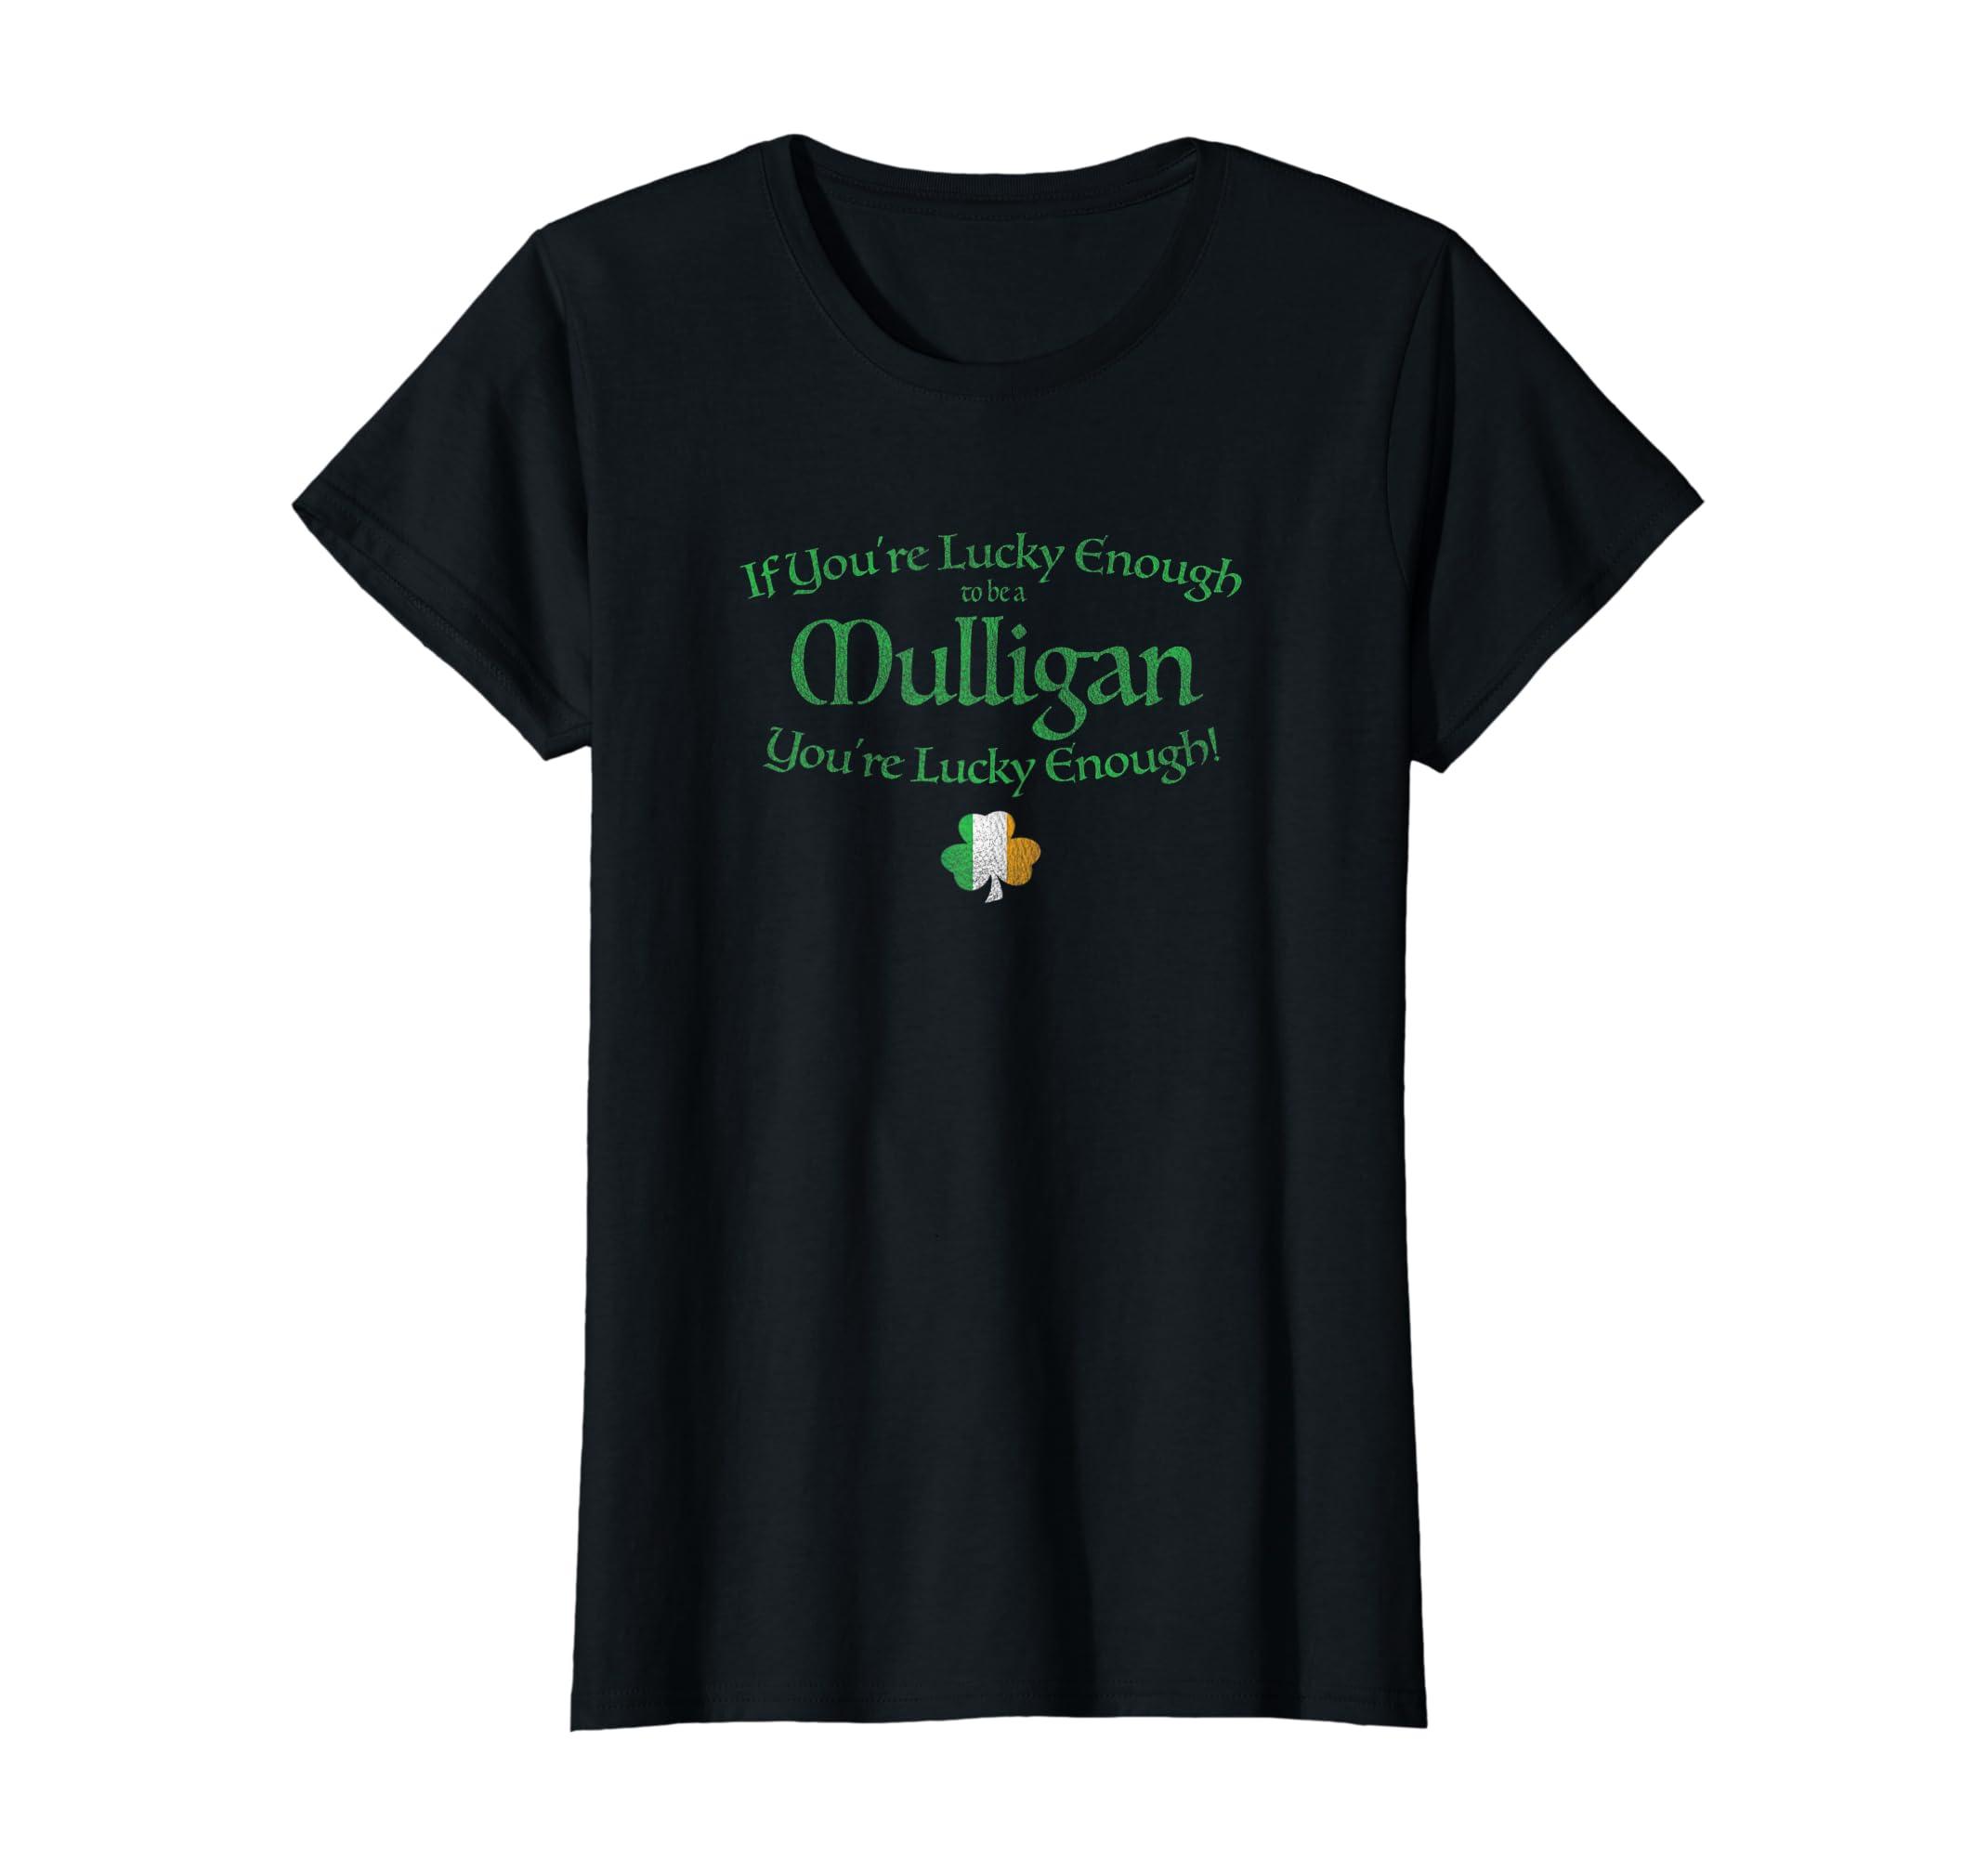 dc9cd289 Amazon.com: If You're Mulligan You're Lucky Enough Irish Name T-Shirt:  Clothing